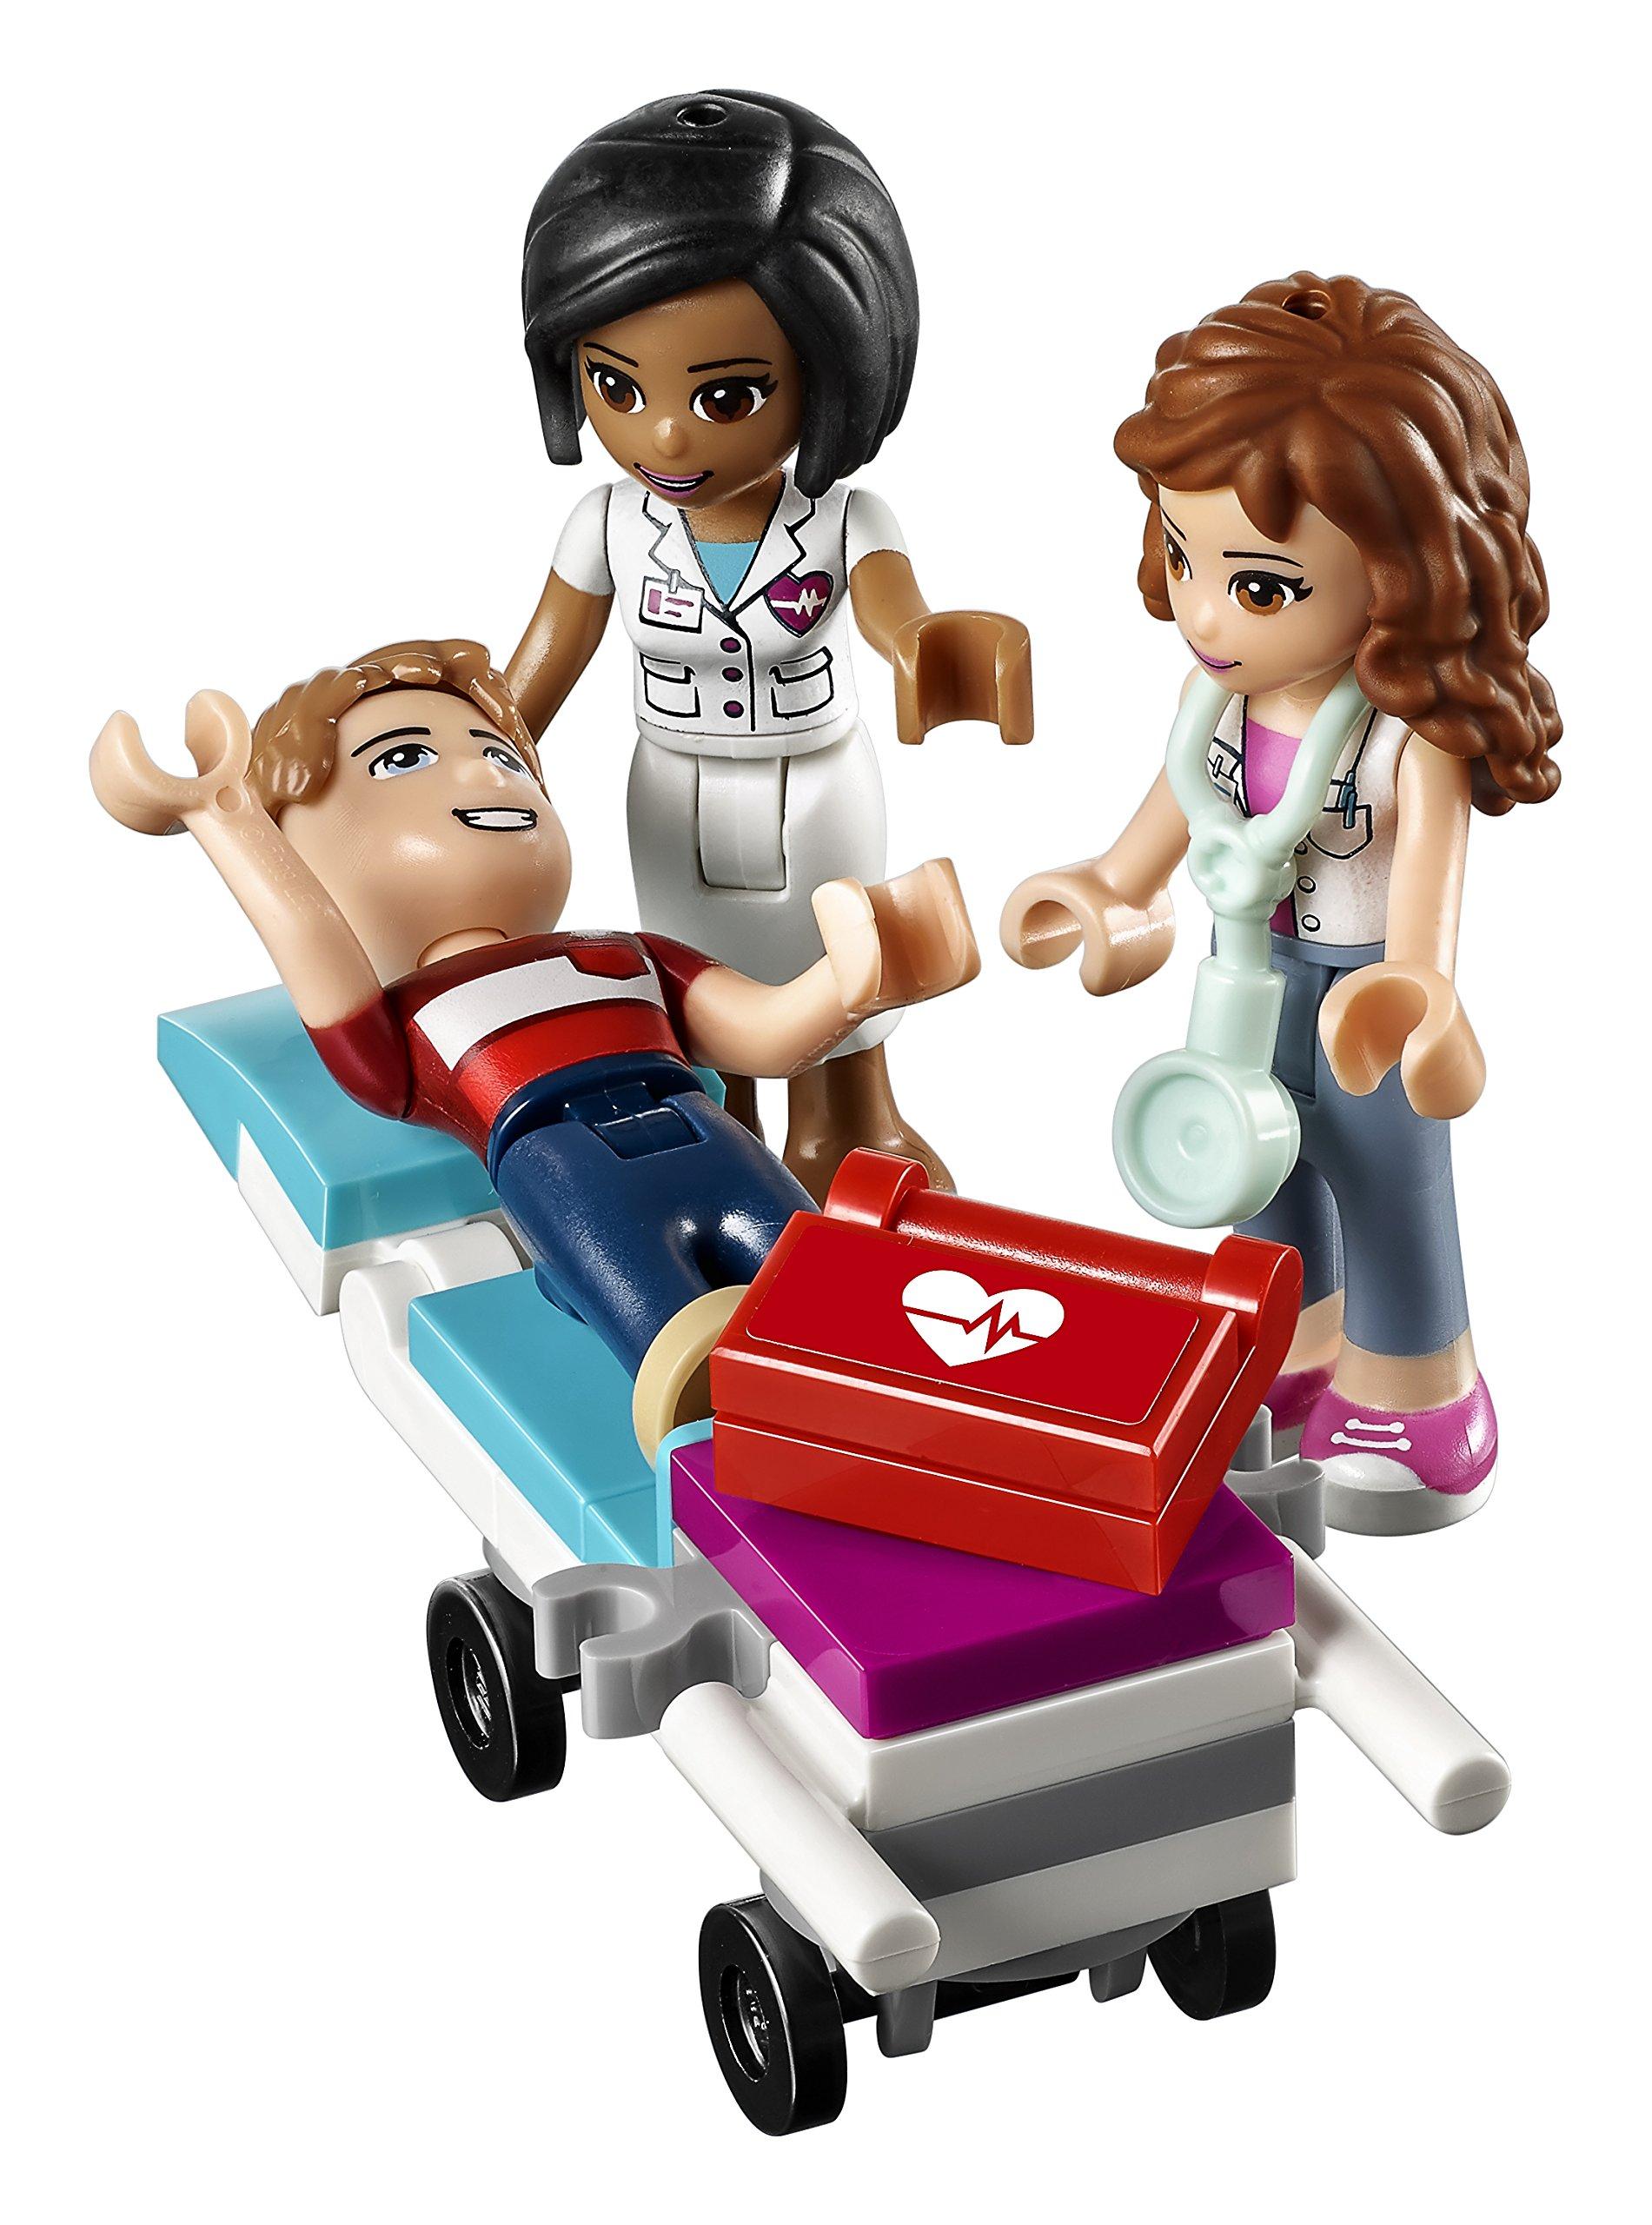 LEGO Friends Heartlake Hospital 41318 Building Kit (871 Piece) by LEGO (Image #7)